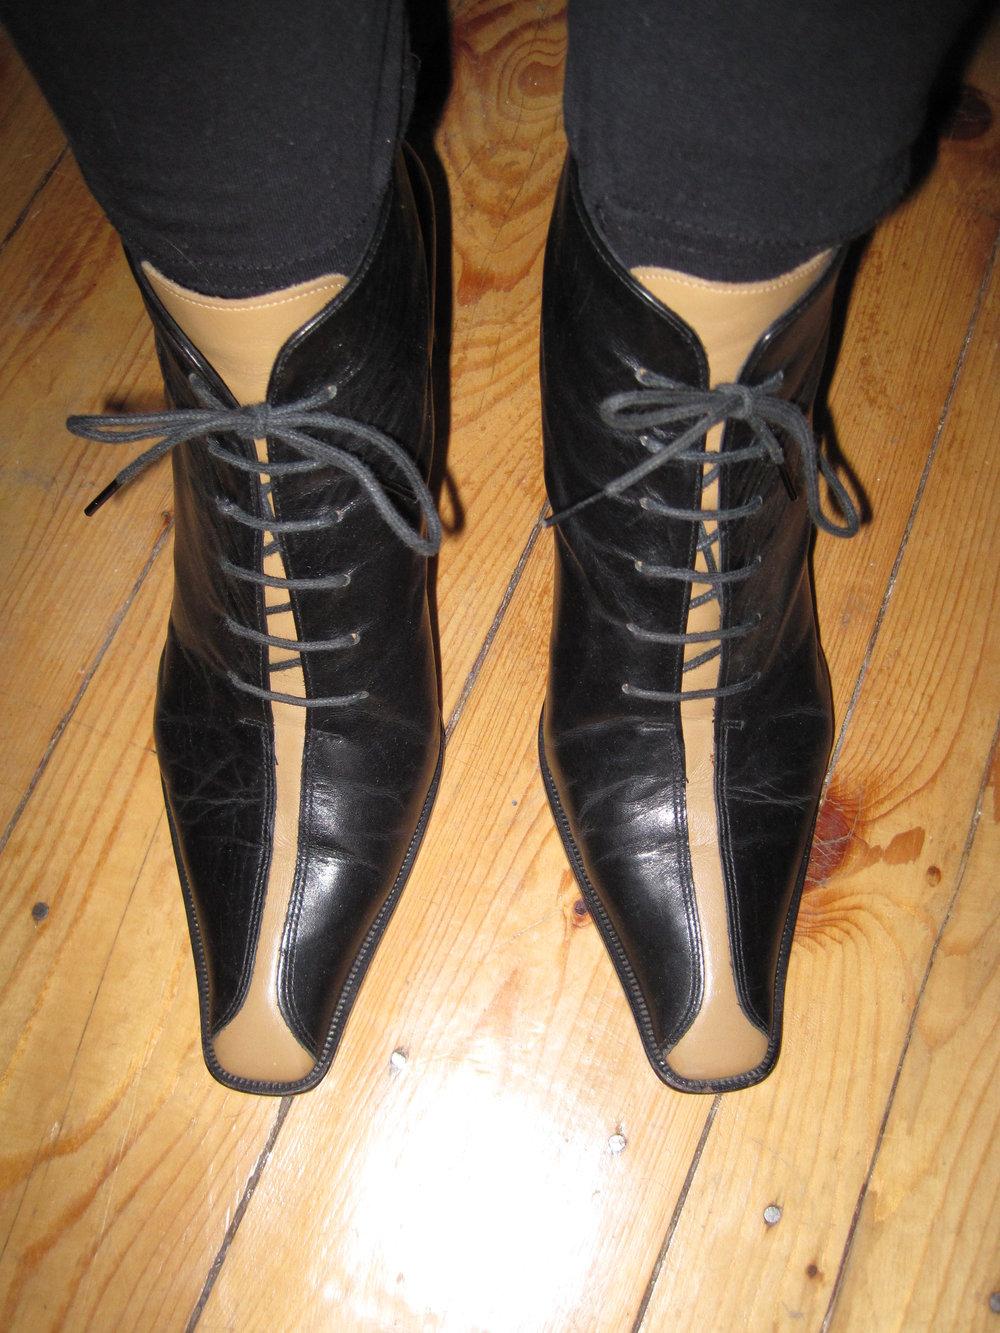 Ausgefallene Bernd Berger Leder Ankle Boots Stiefeletten Schnürer Vintage  Hippie 38 ... e16e62ed0b